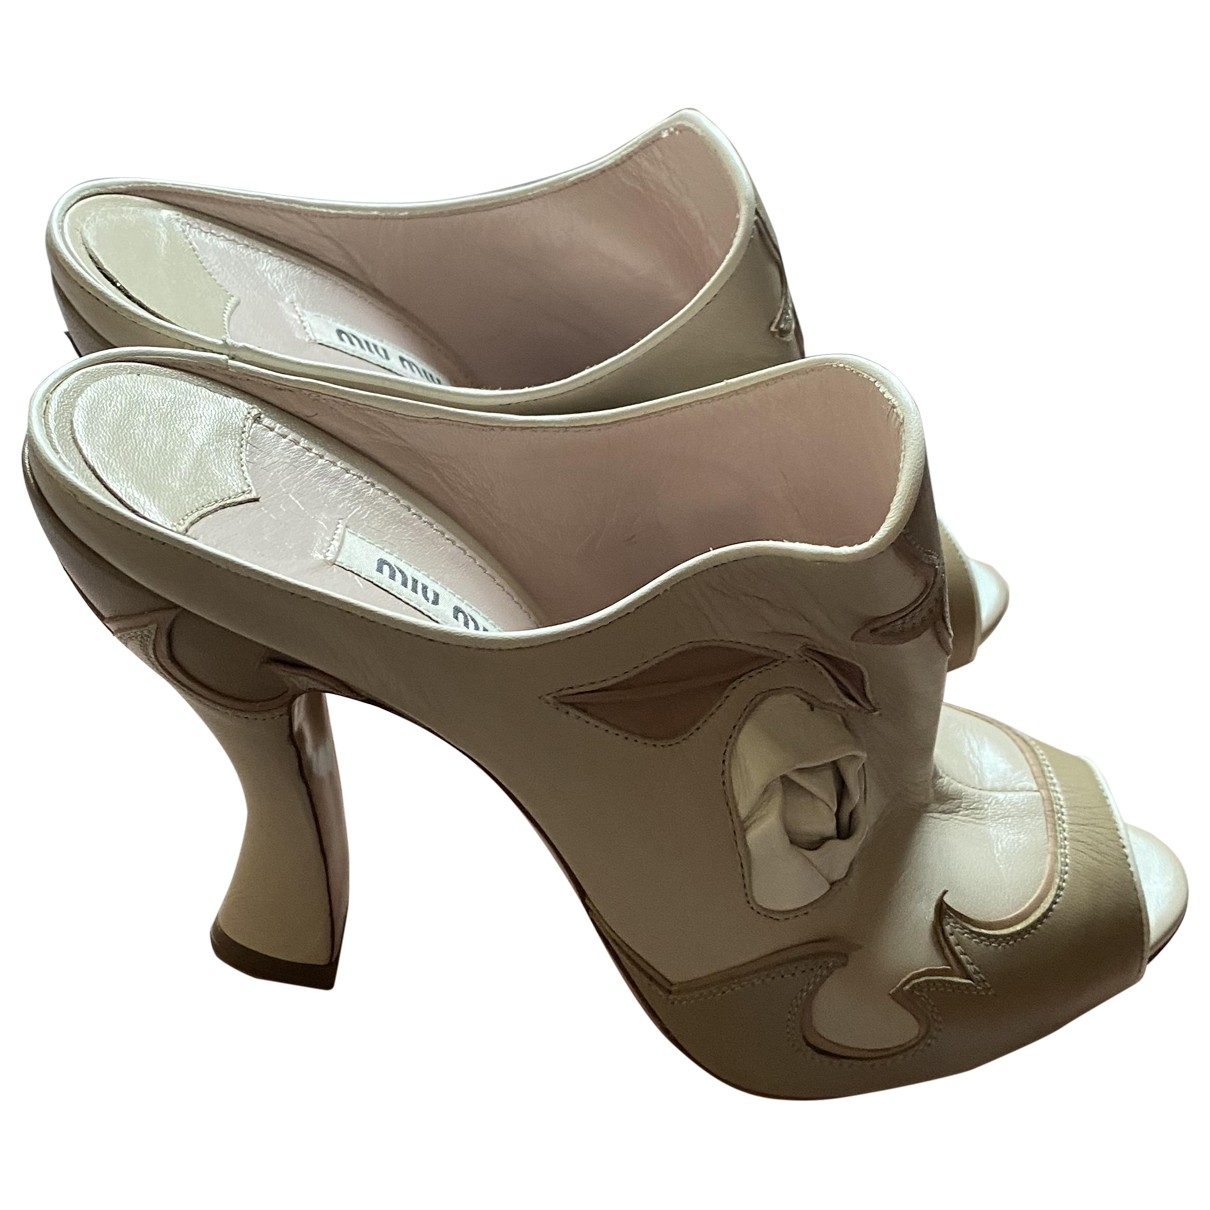 Miu Miu \N Beige Leather Sandals for Women 8 UK